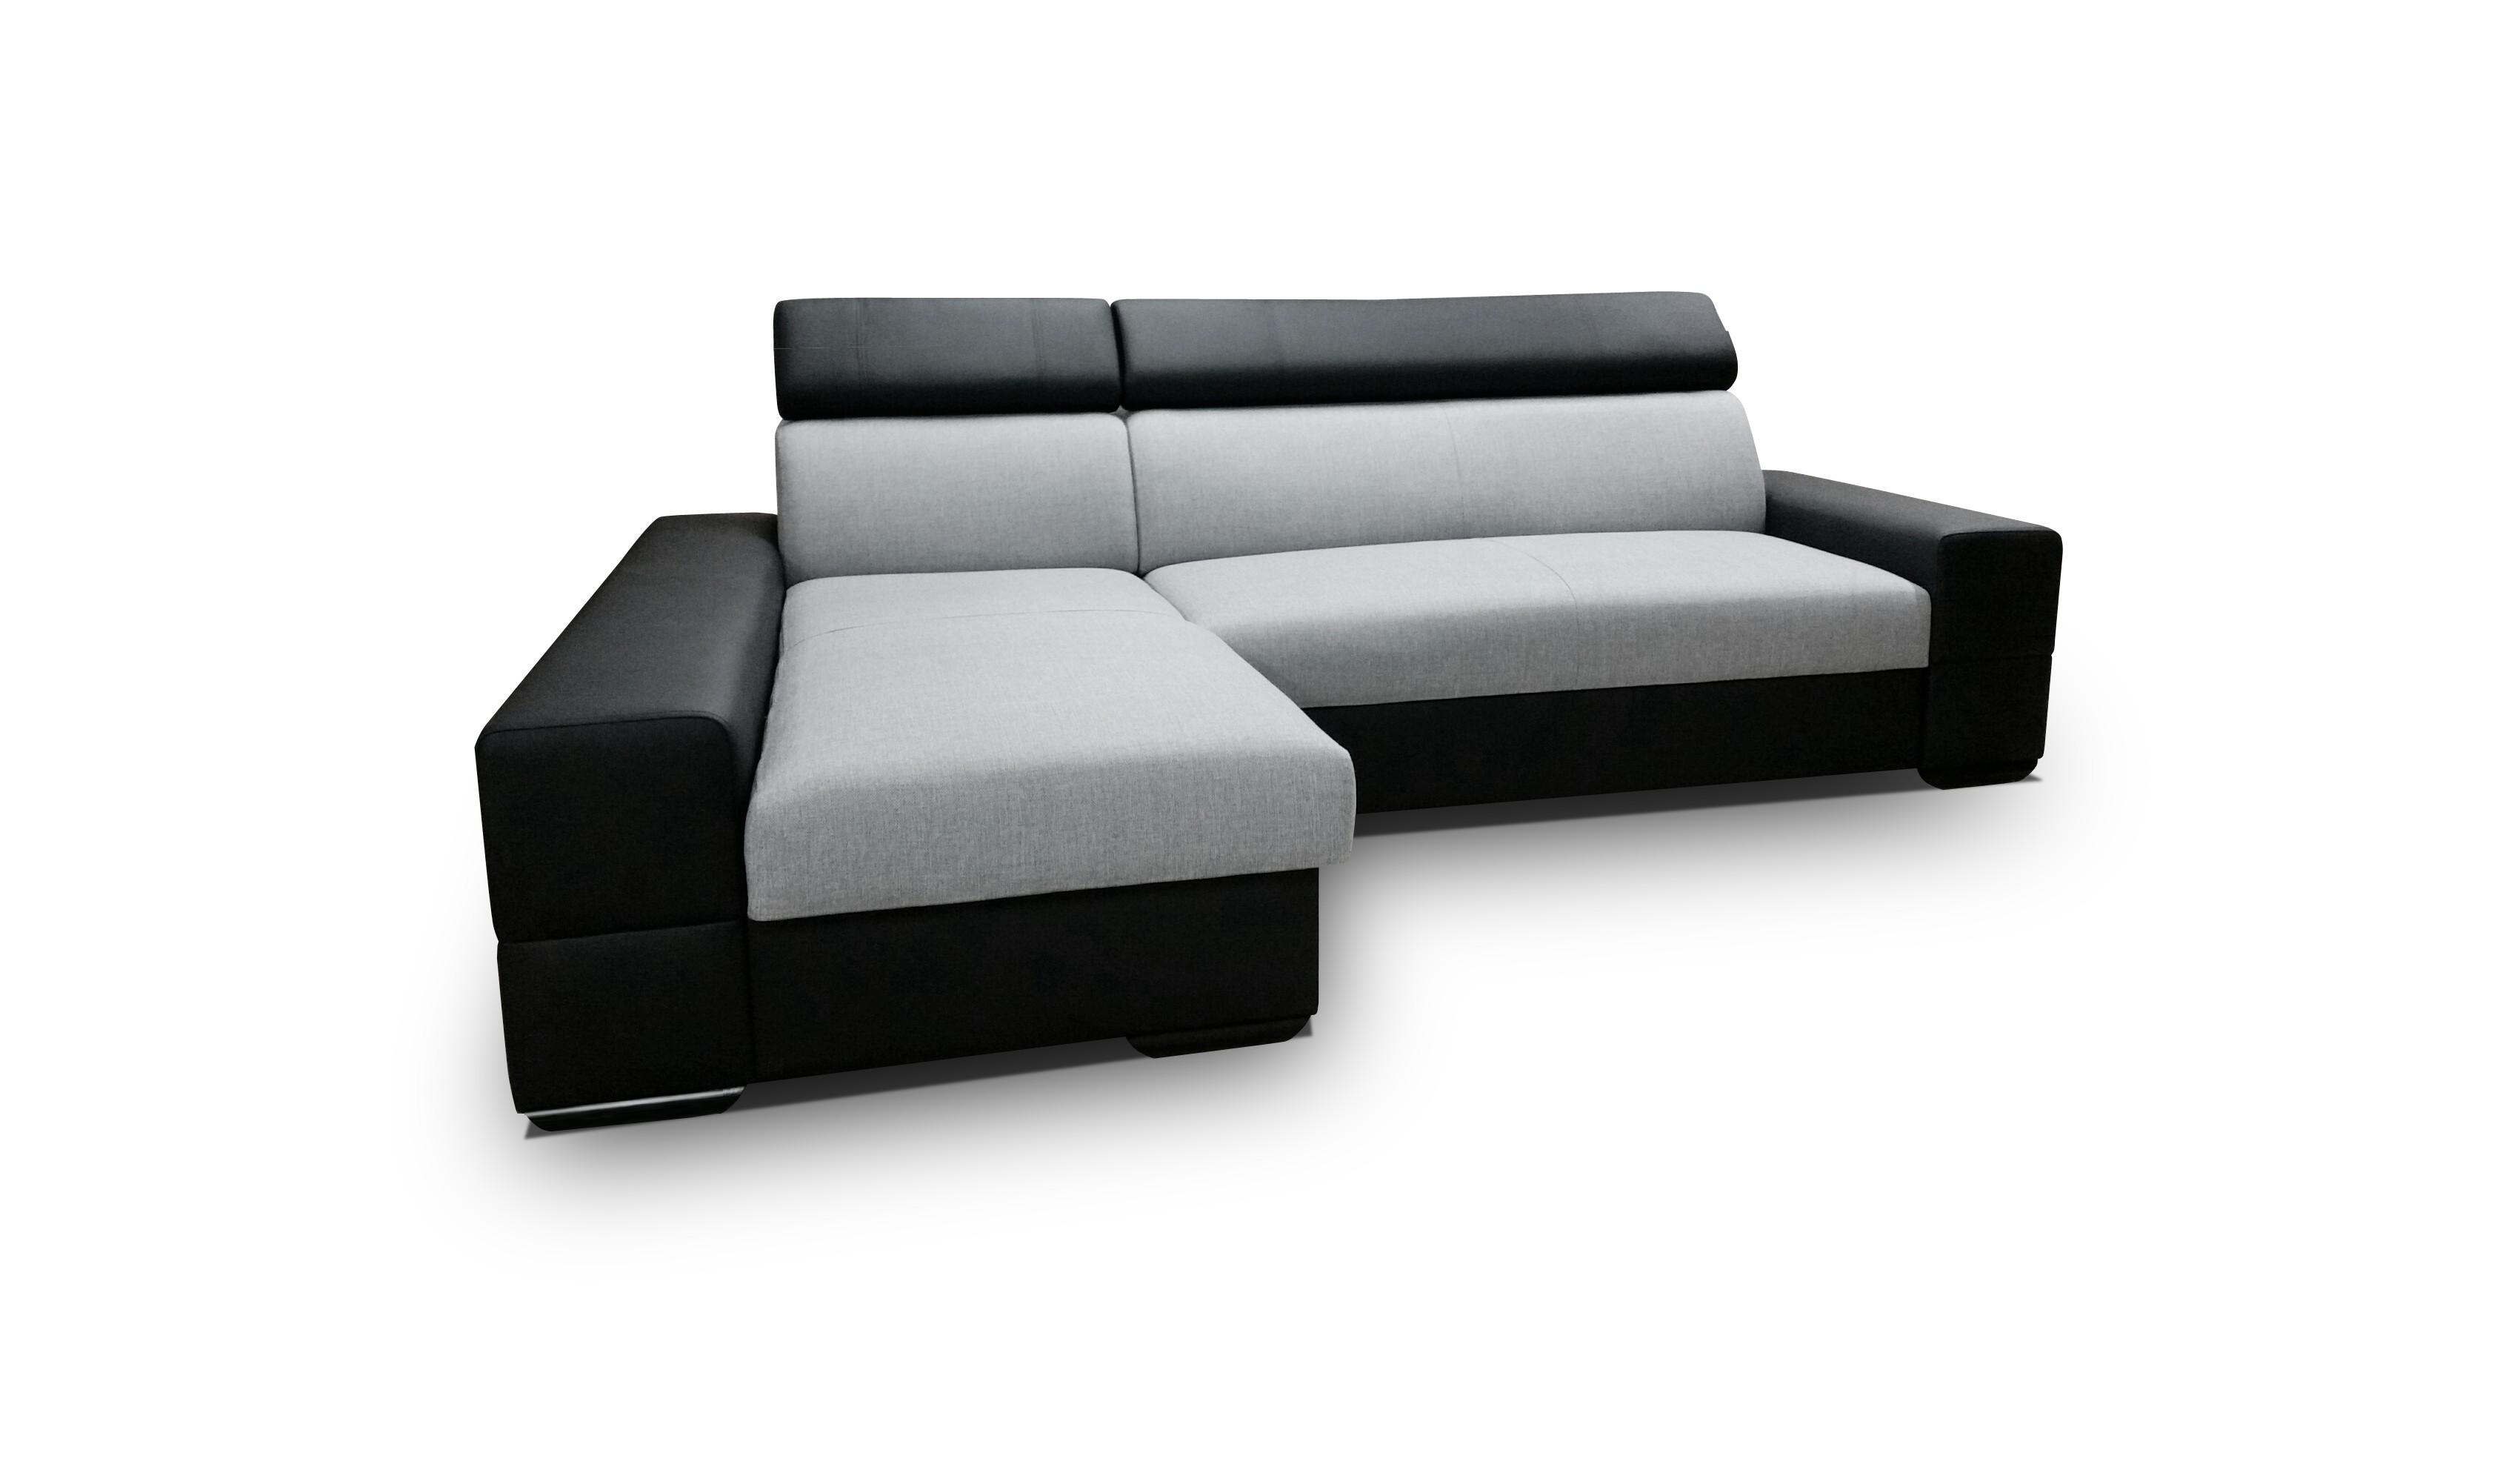 Smartshop Rohová sedačka CORTINA 3, levá, šedá látka/černá ekokůže